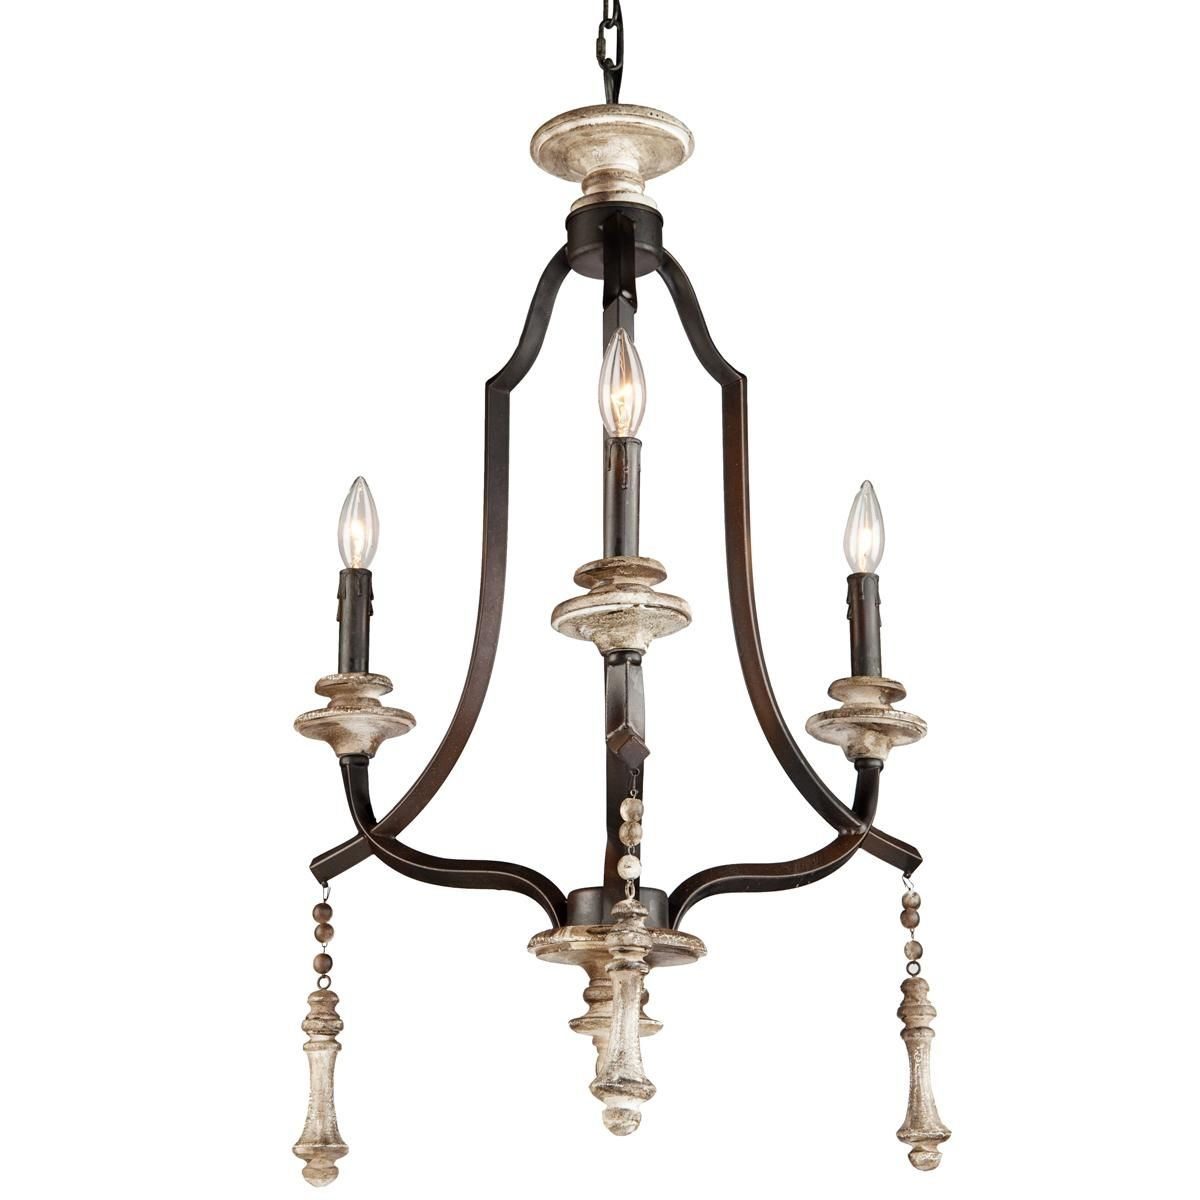 Strata art glass pendant light weathered wood mini chandelier and